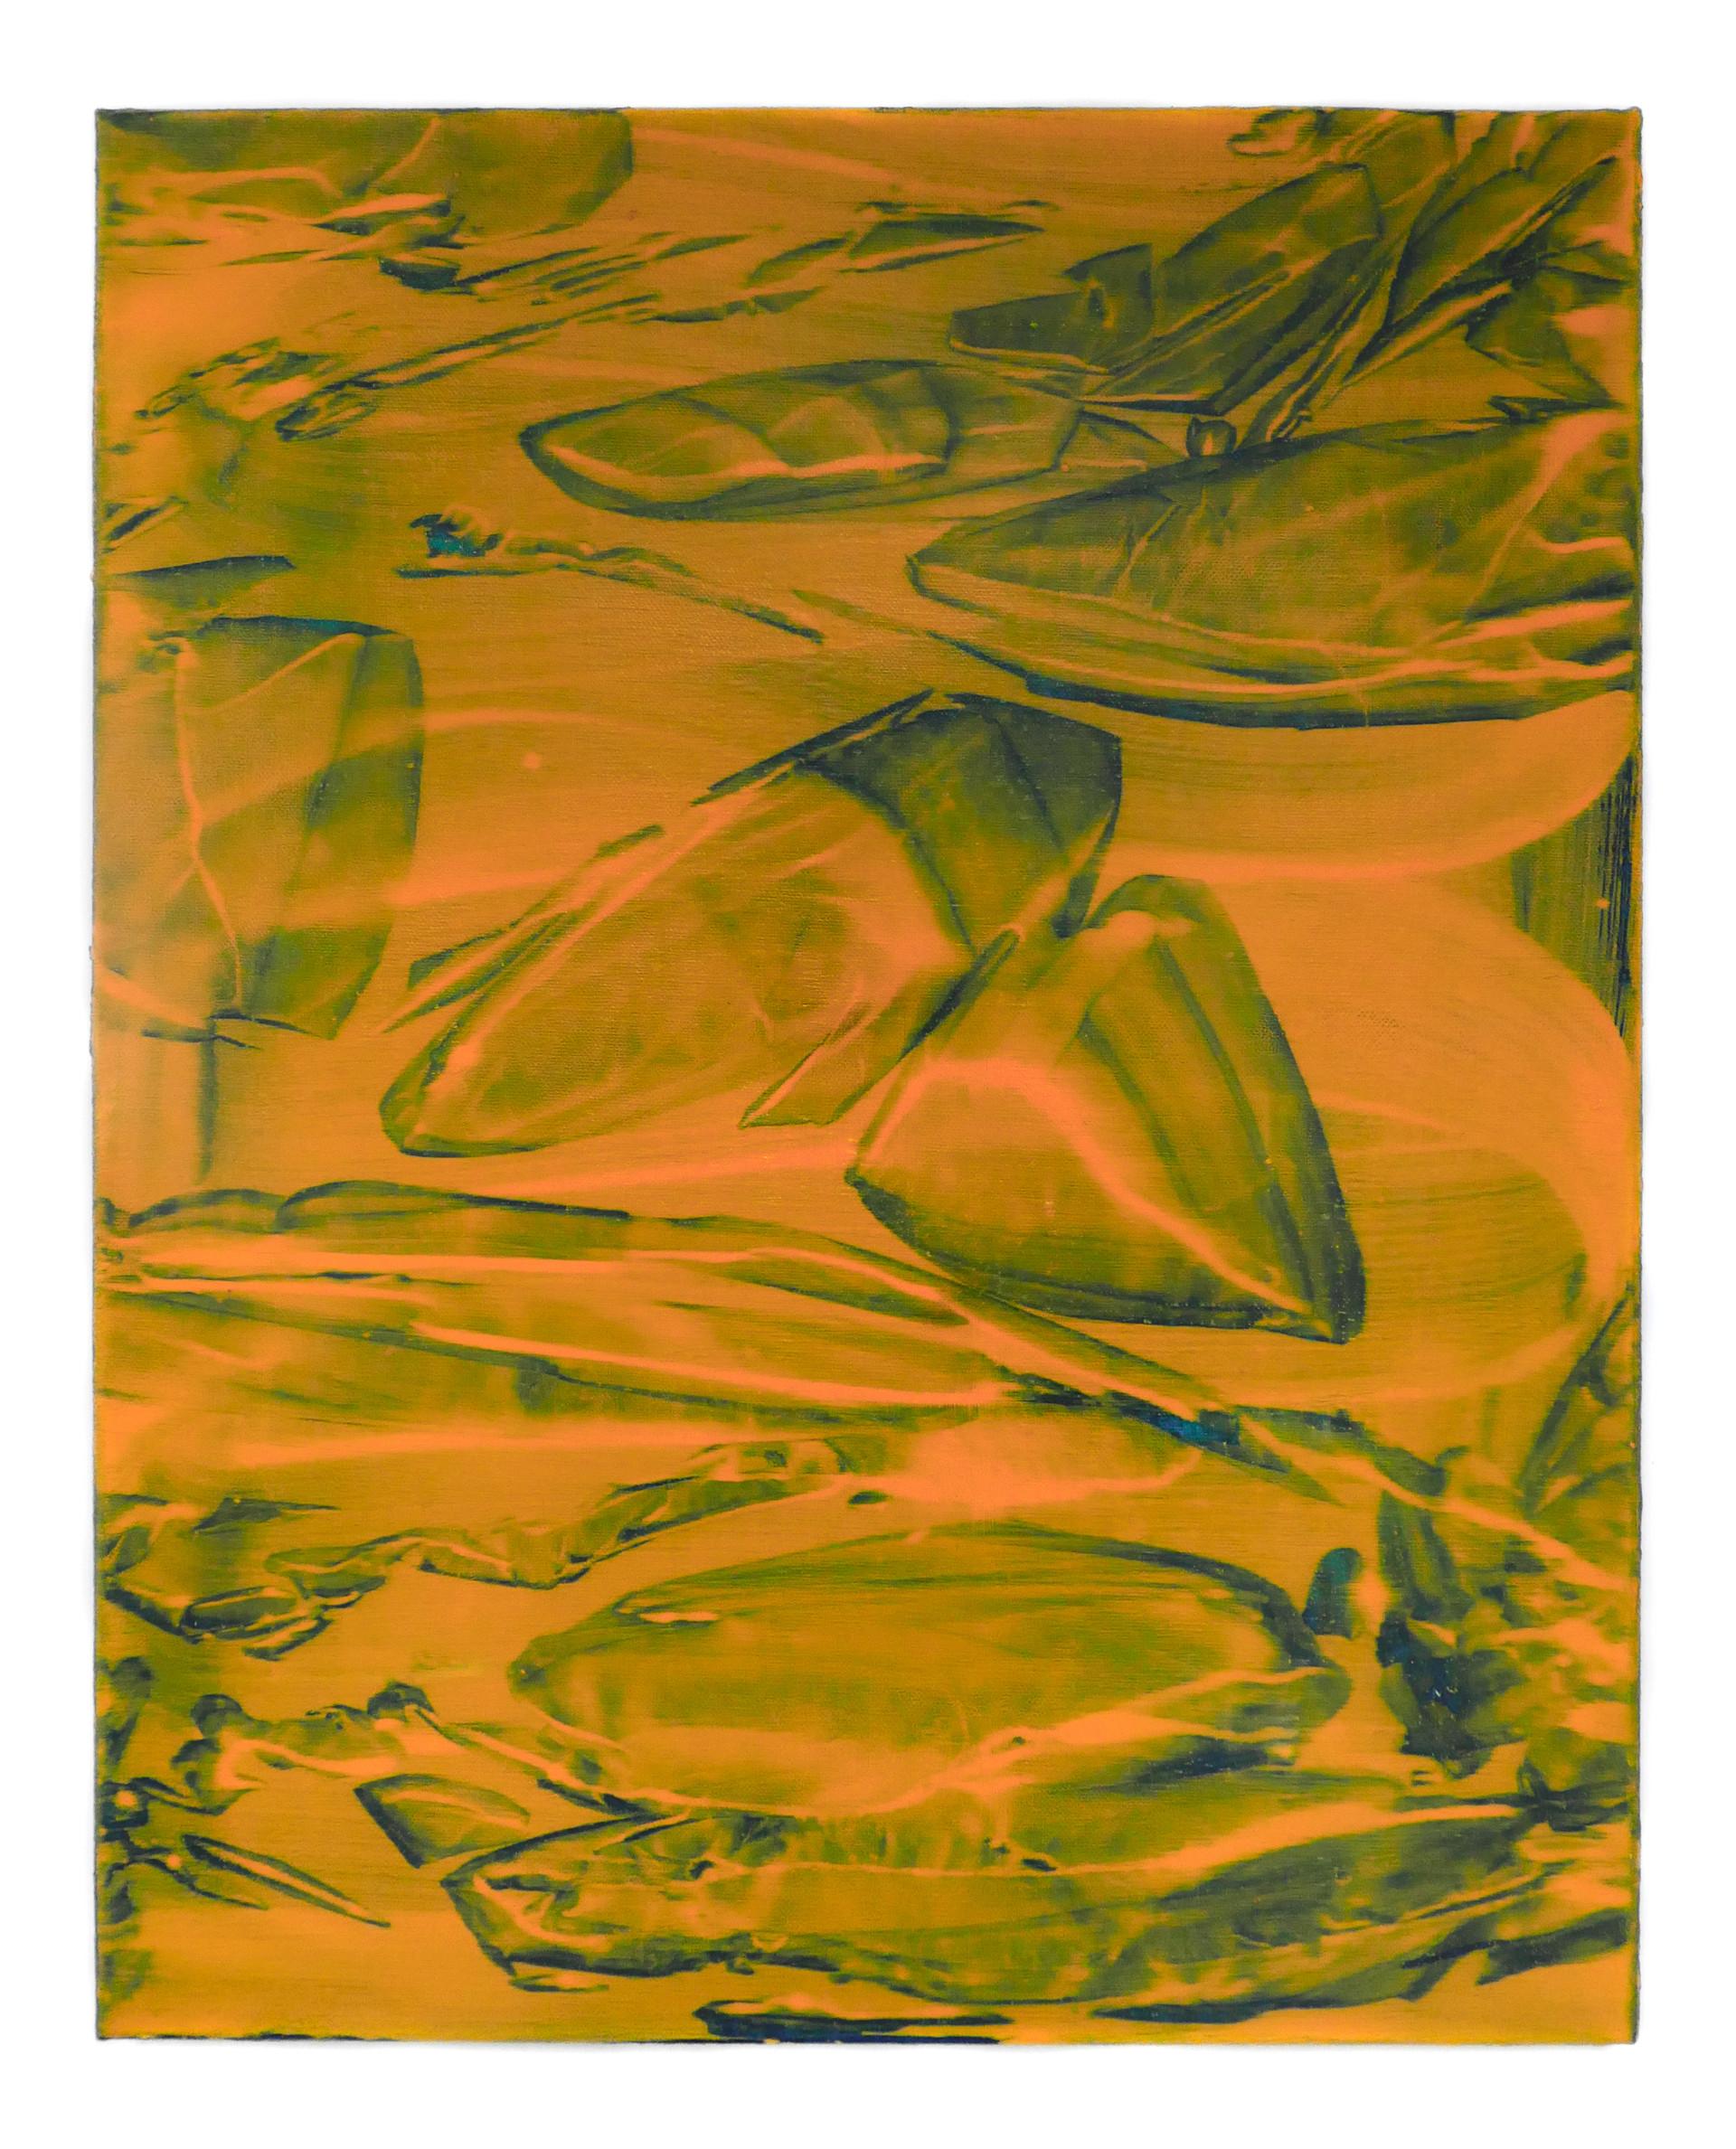 glitch, 2018, oil on linen, 51 x 41cm